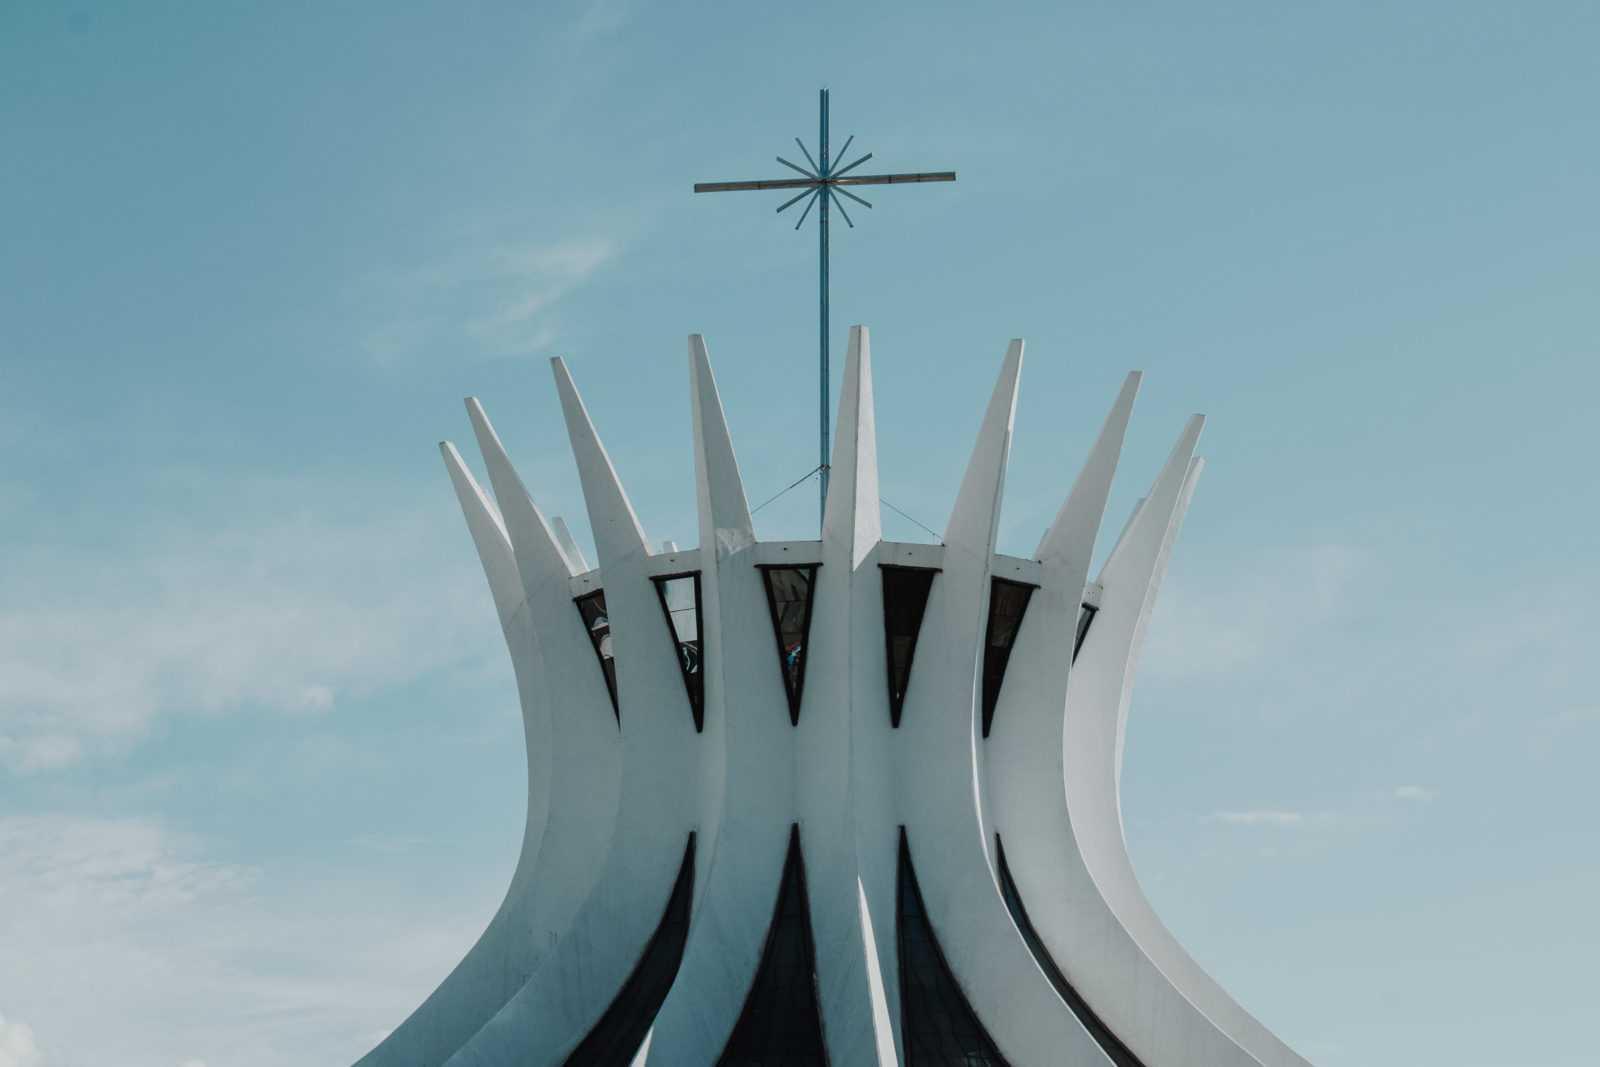 Brasilia Sehenswürdigkeiten Kathedrale Brasilia Oscar Niemeyer Architekt